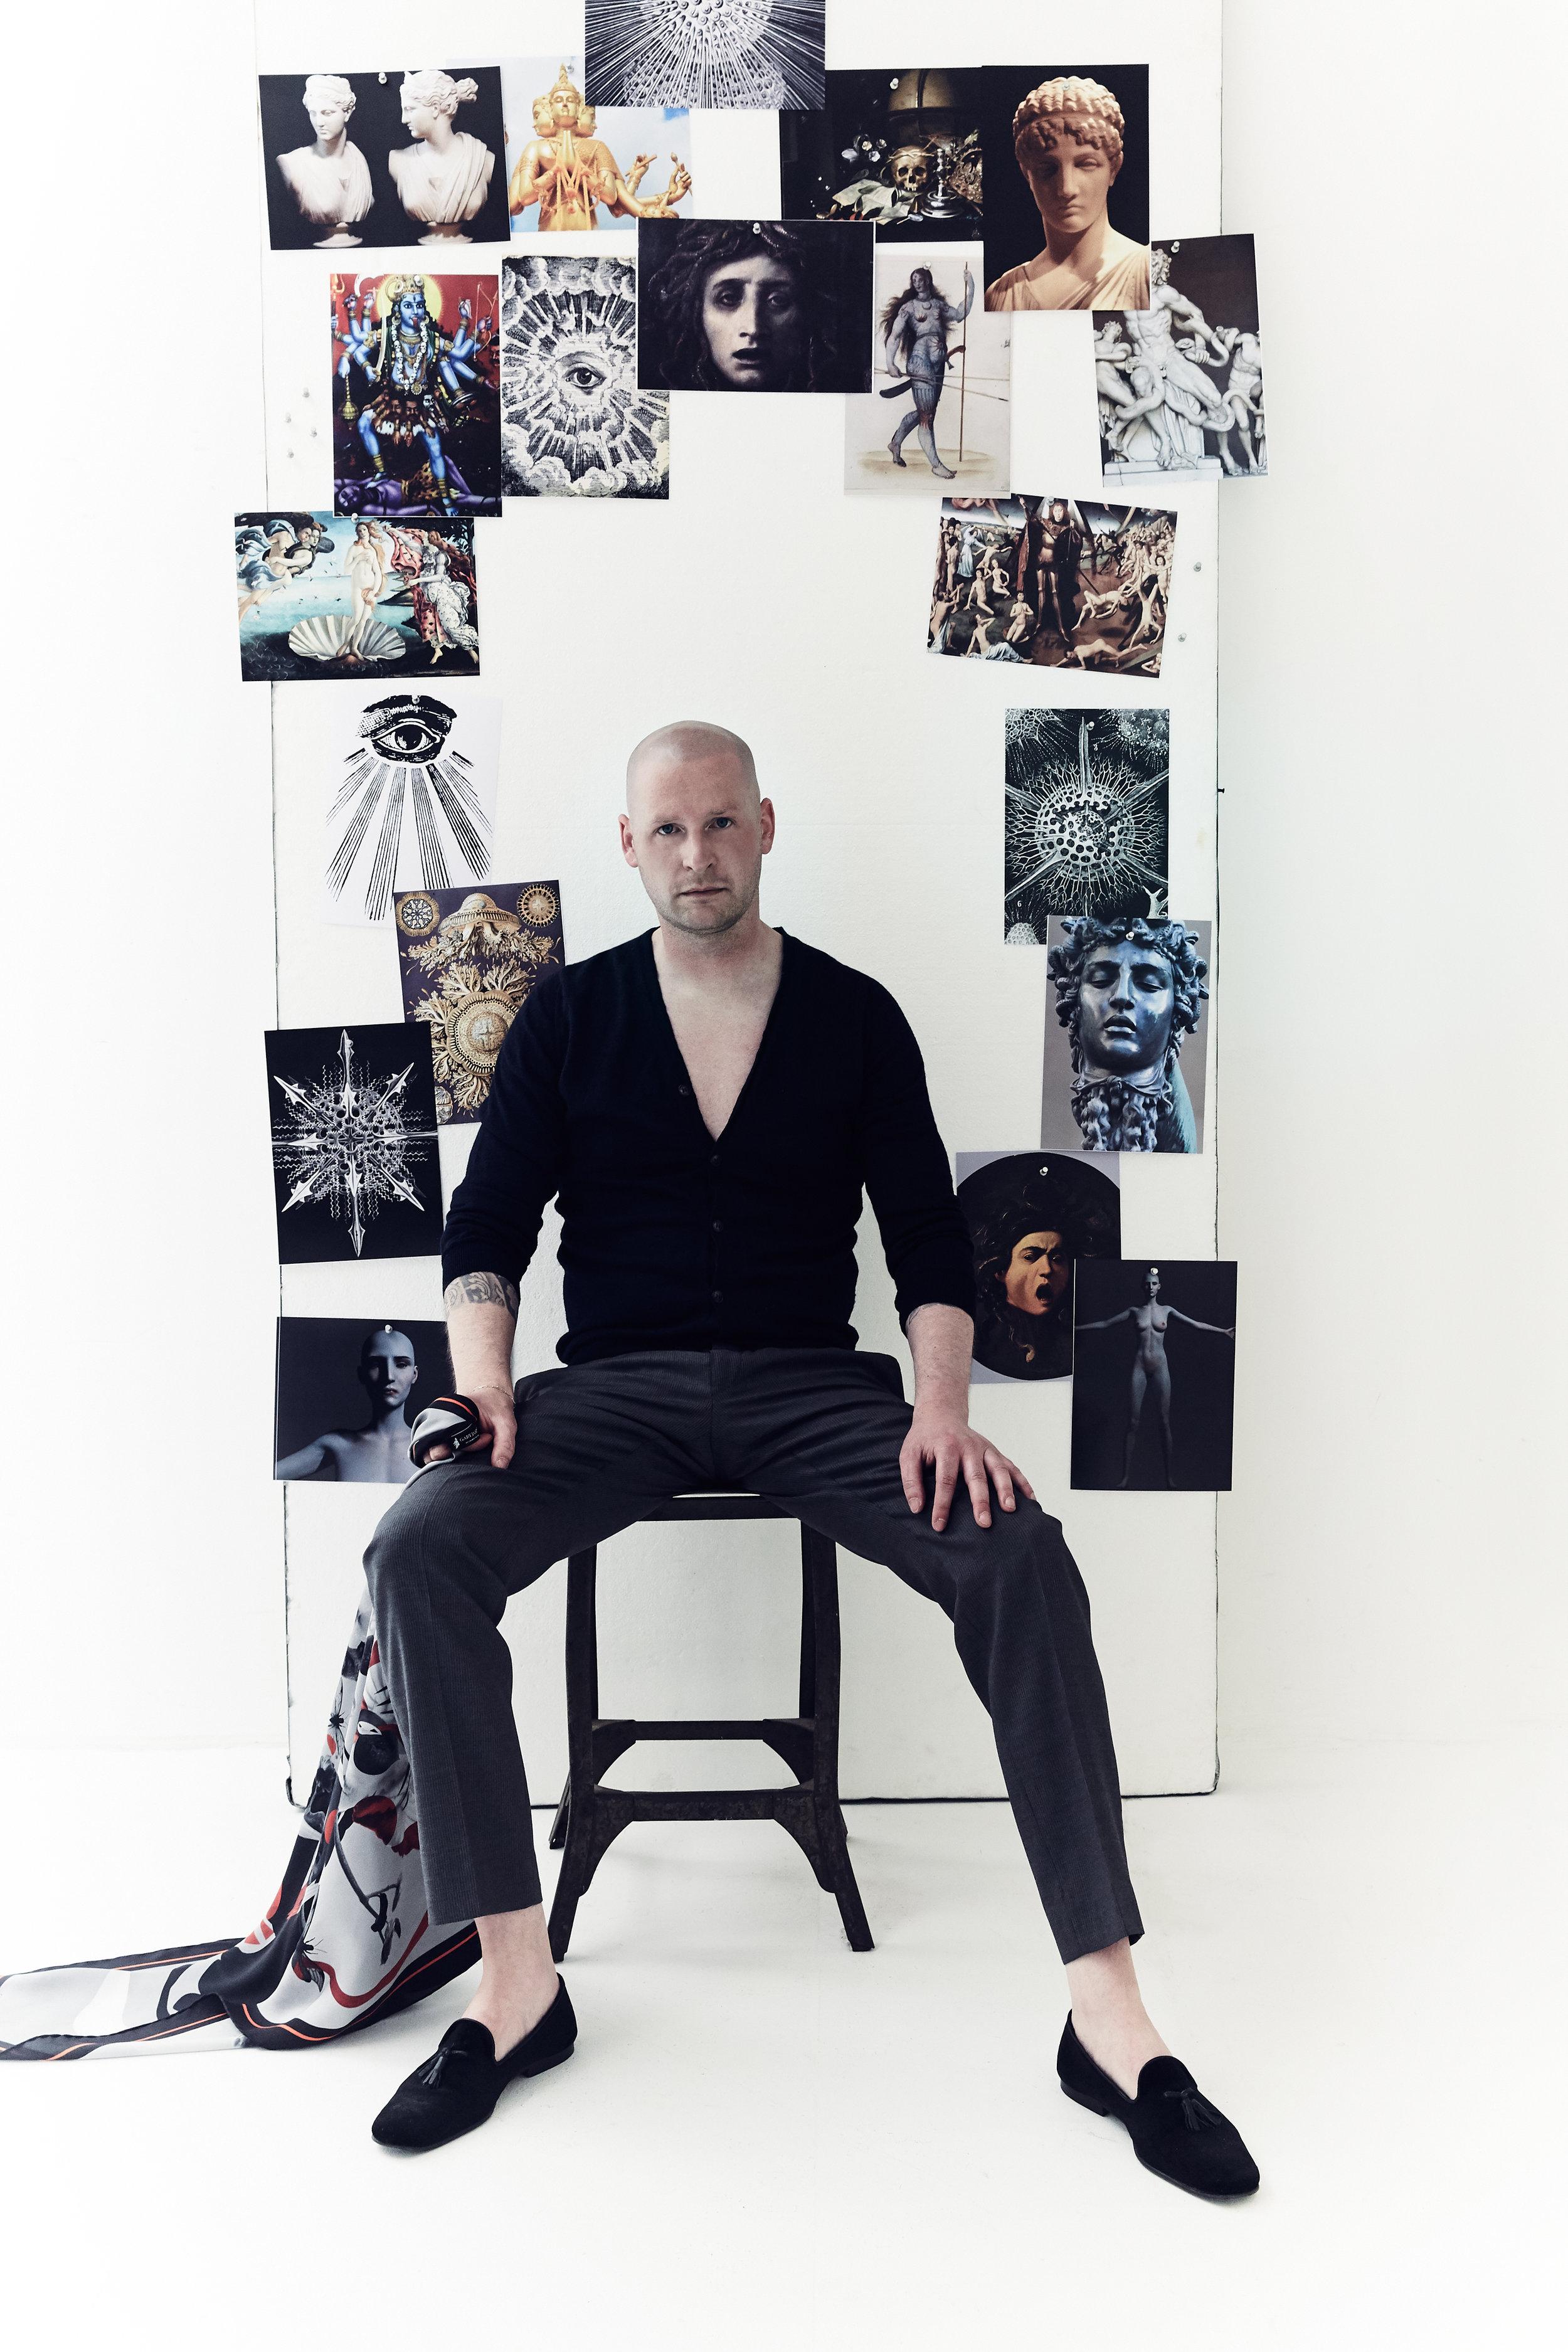 Gary McQueen by Nato Welton.jpg